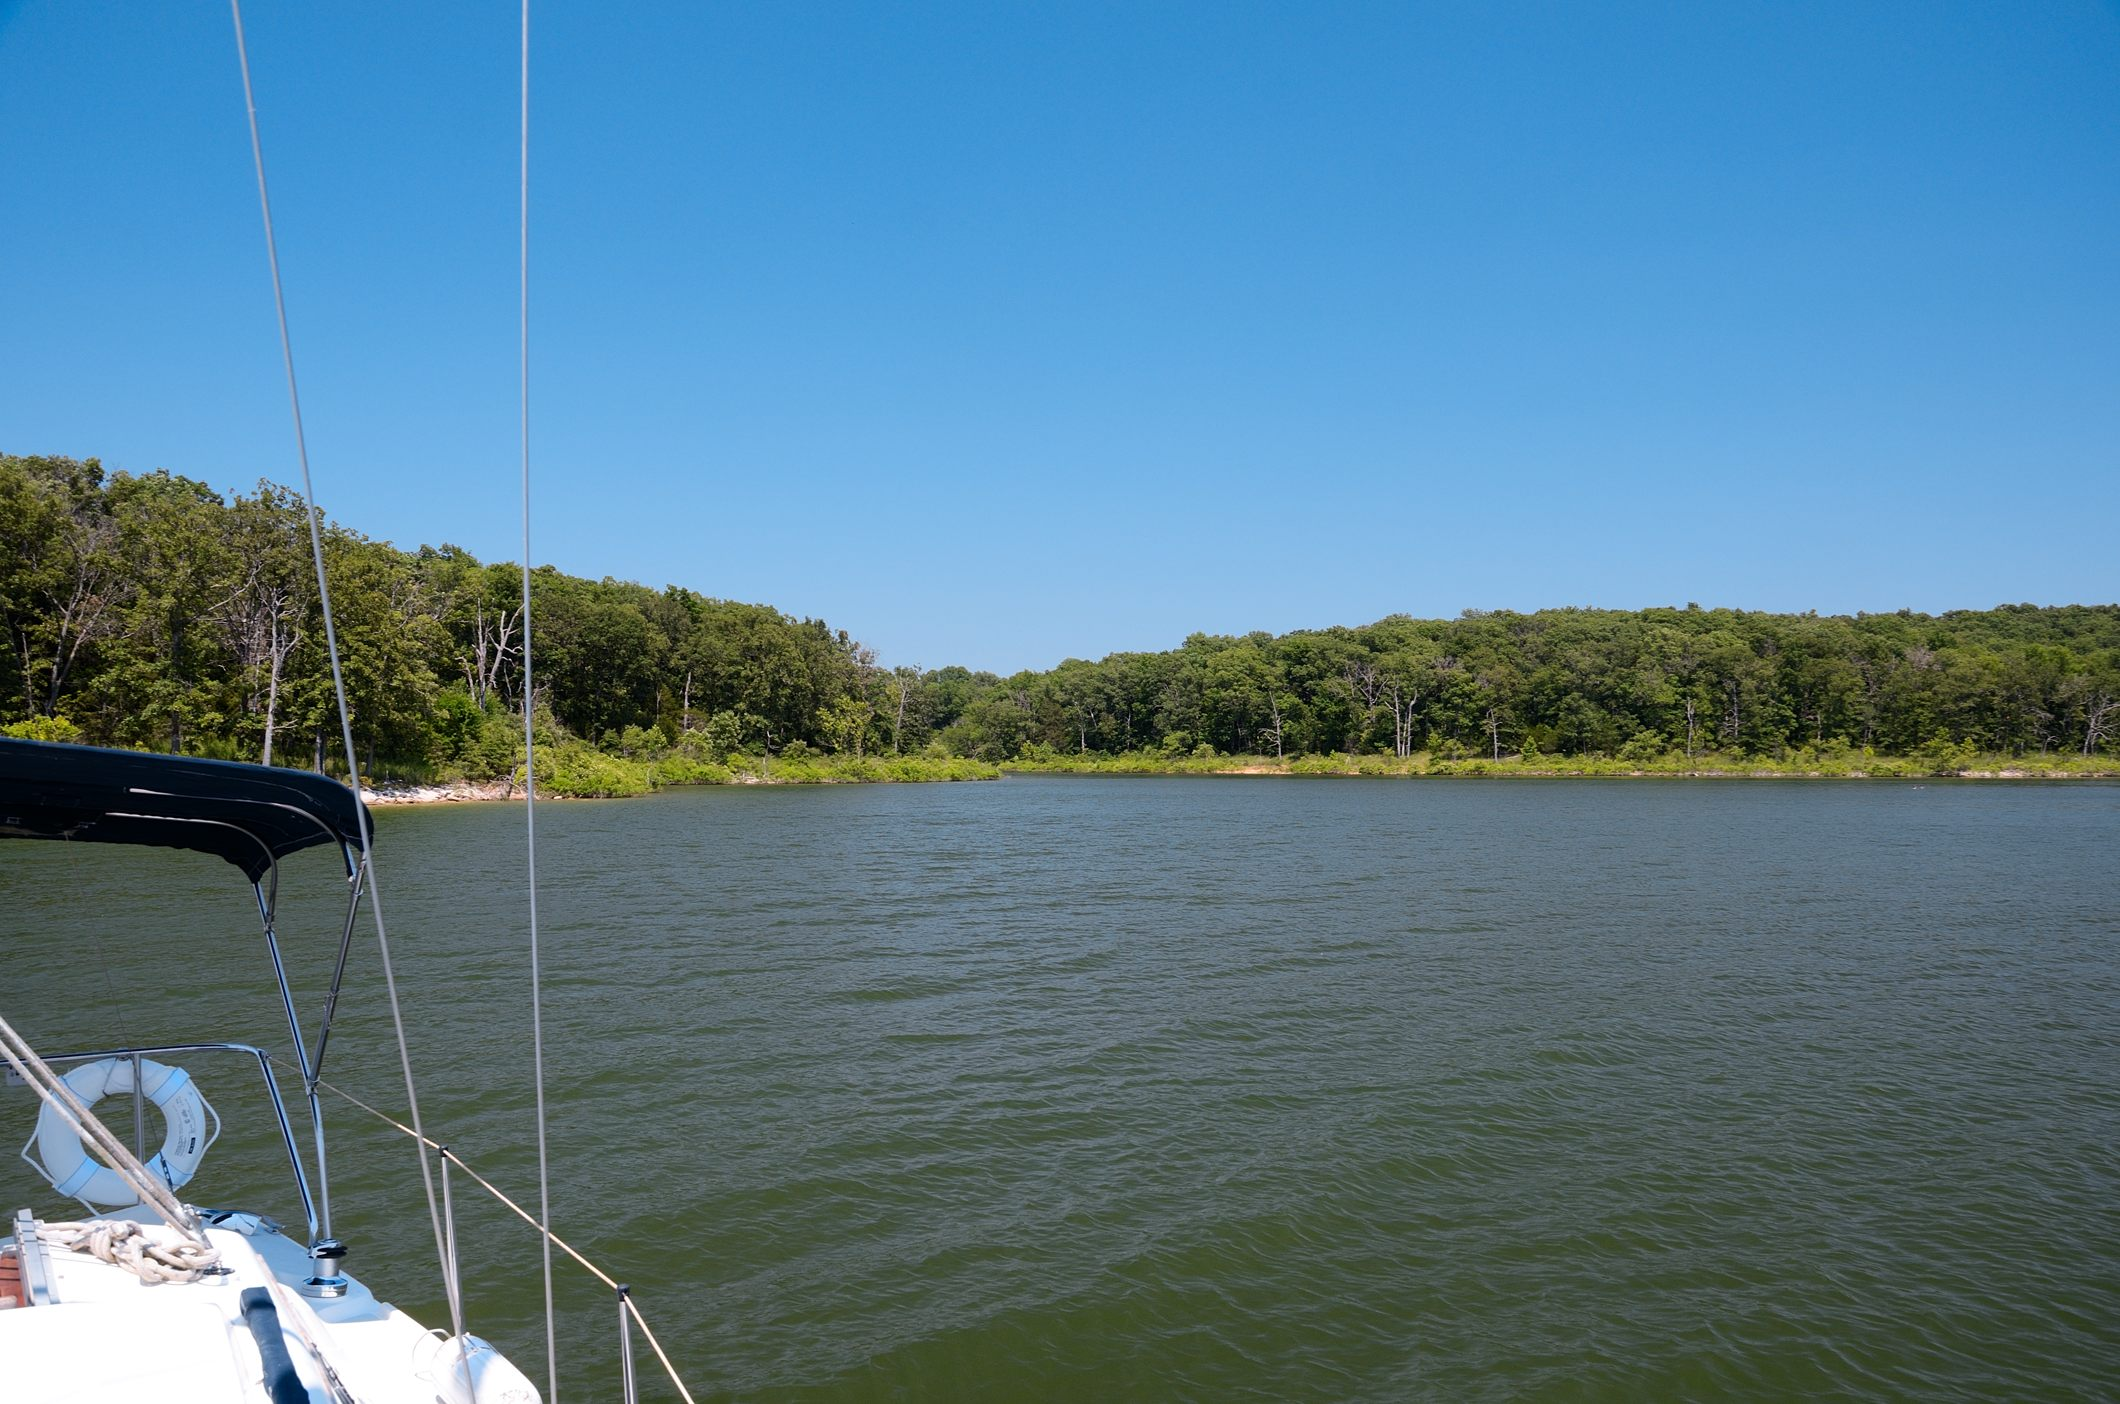 Shoreline of Stockton Lake - www.ozarkswalkabout.com